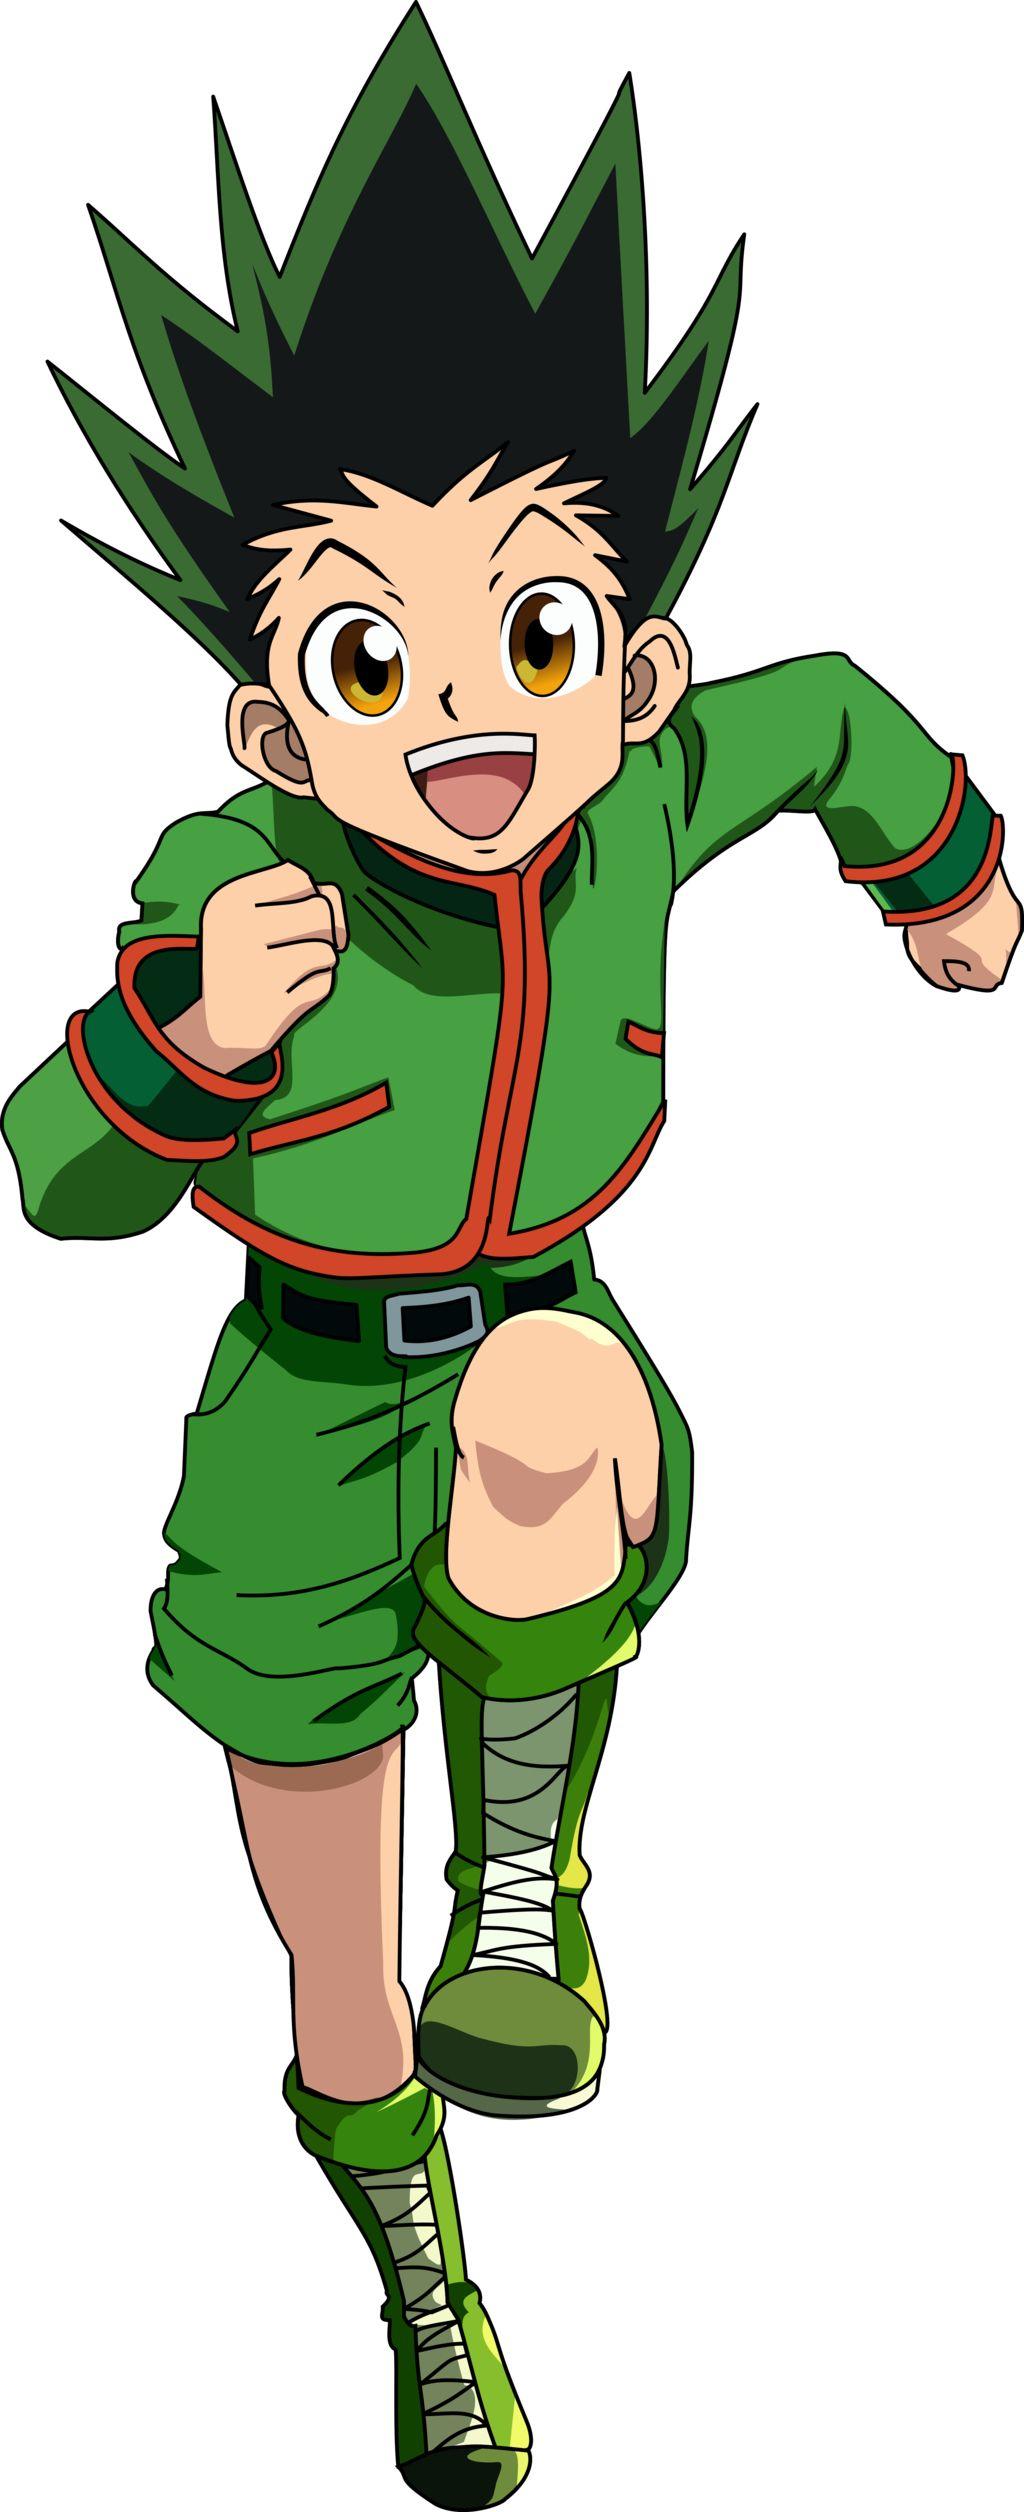 Gon Freecss Hunter X Hunter (With images) Hunter anime